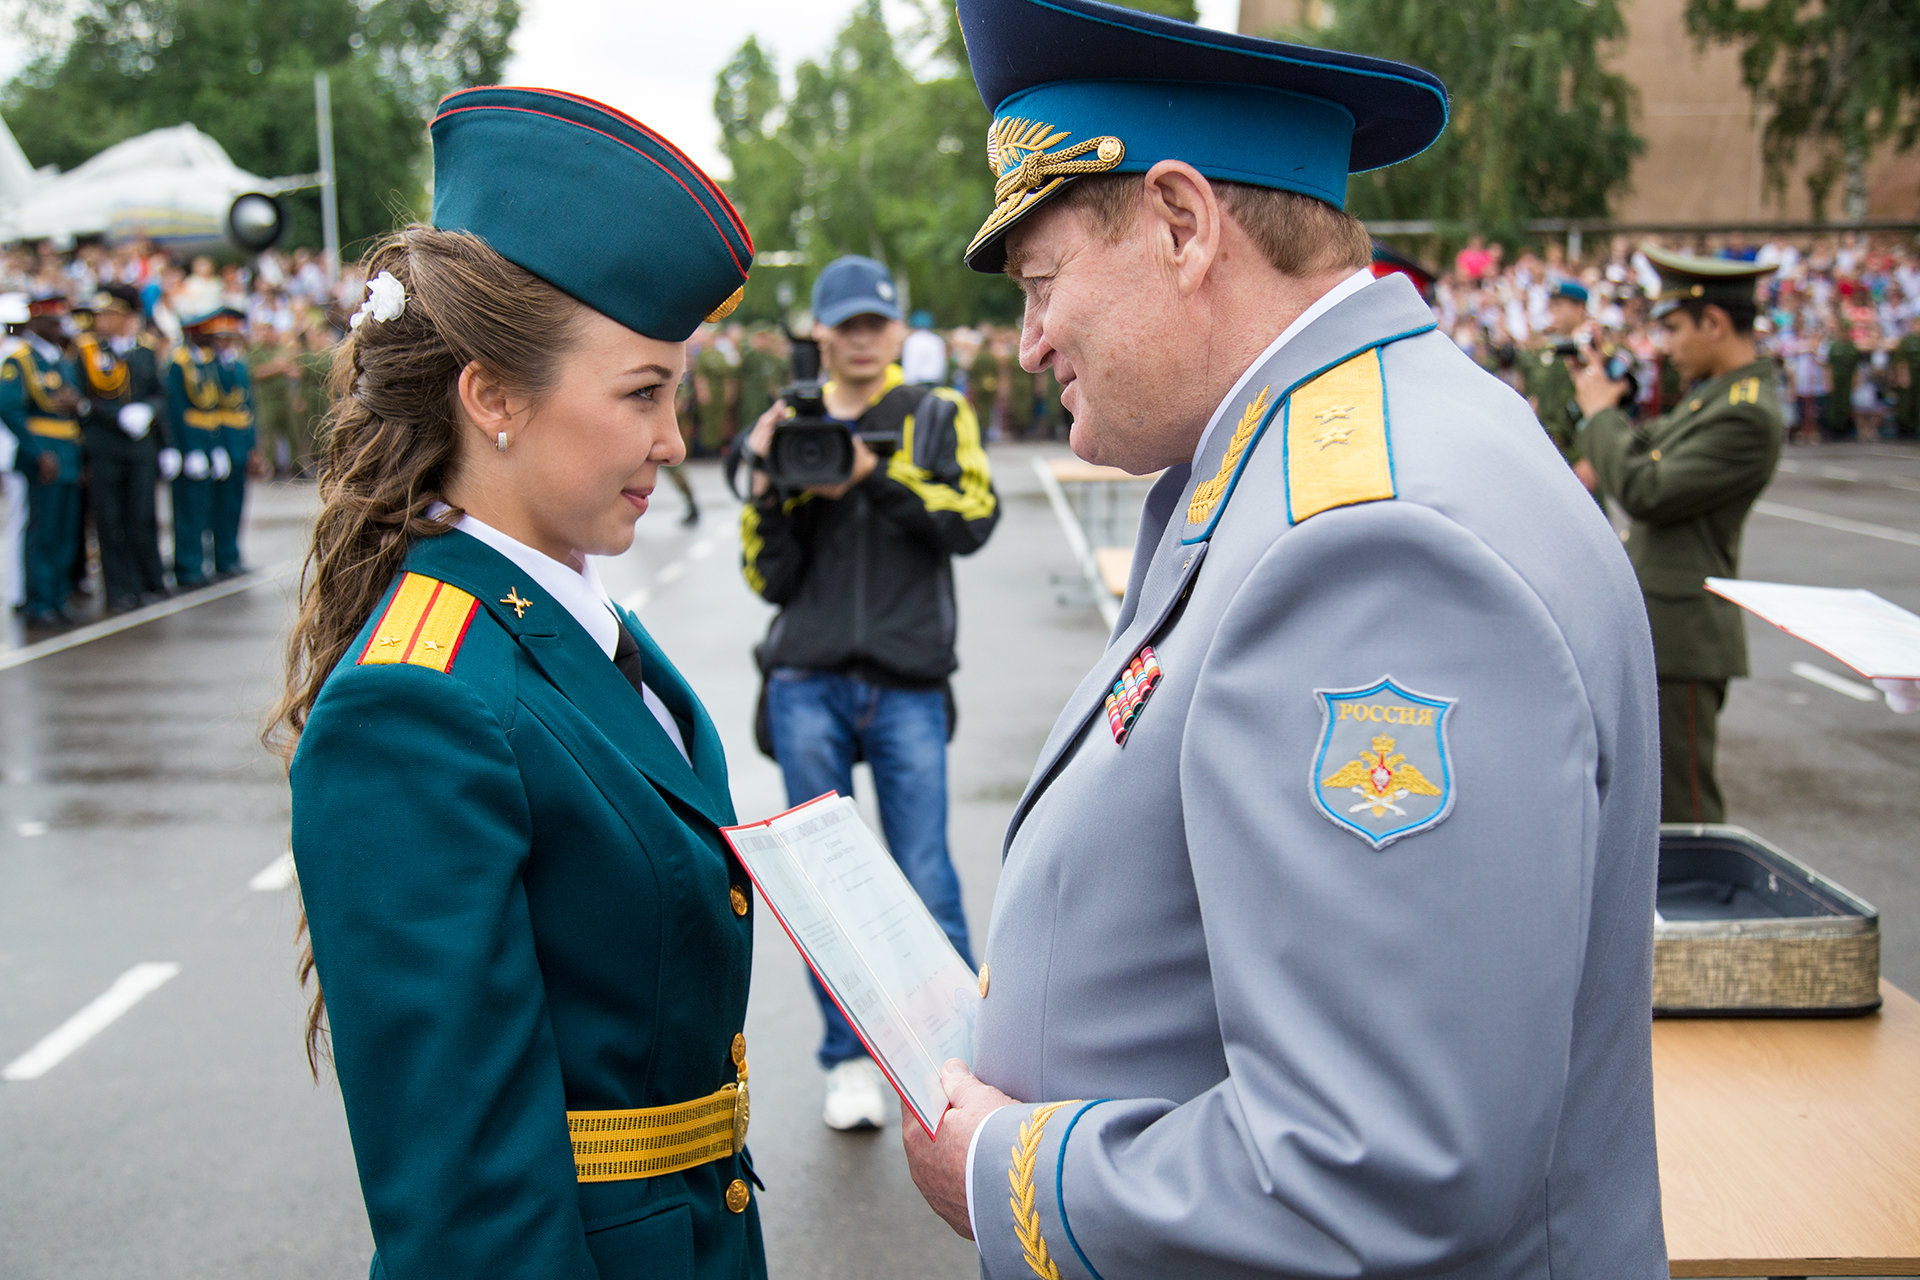 http://volsk64.ru/wp-content/uploads/2014/07/IMG_0584.jpg